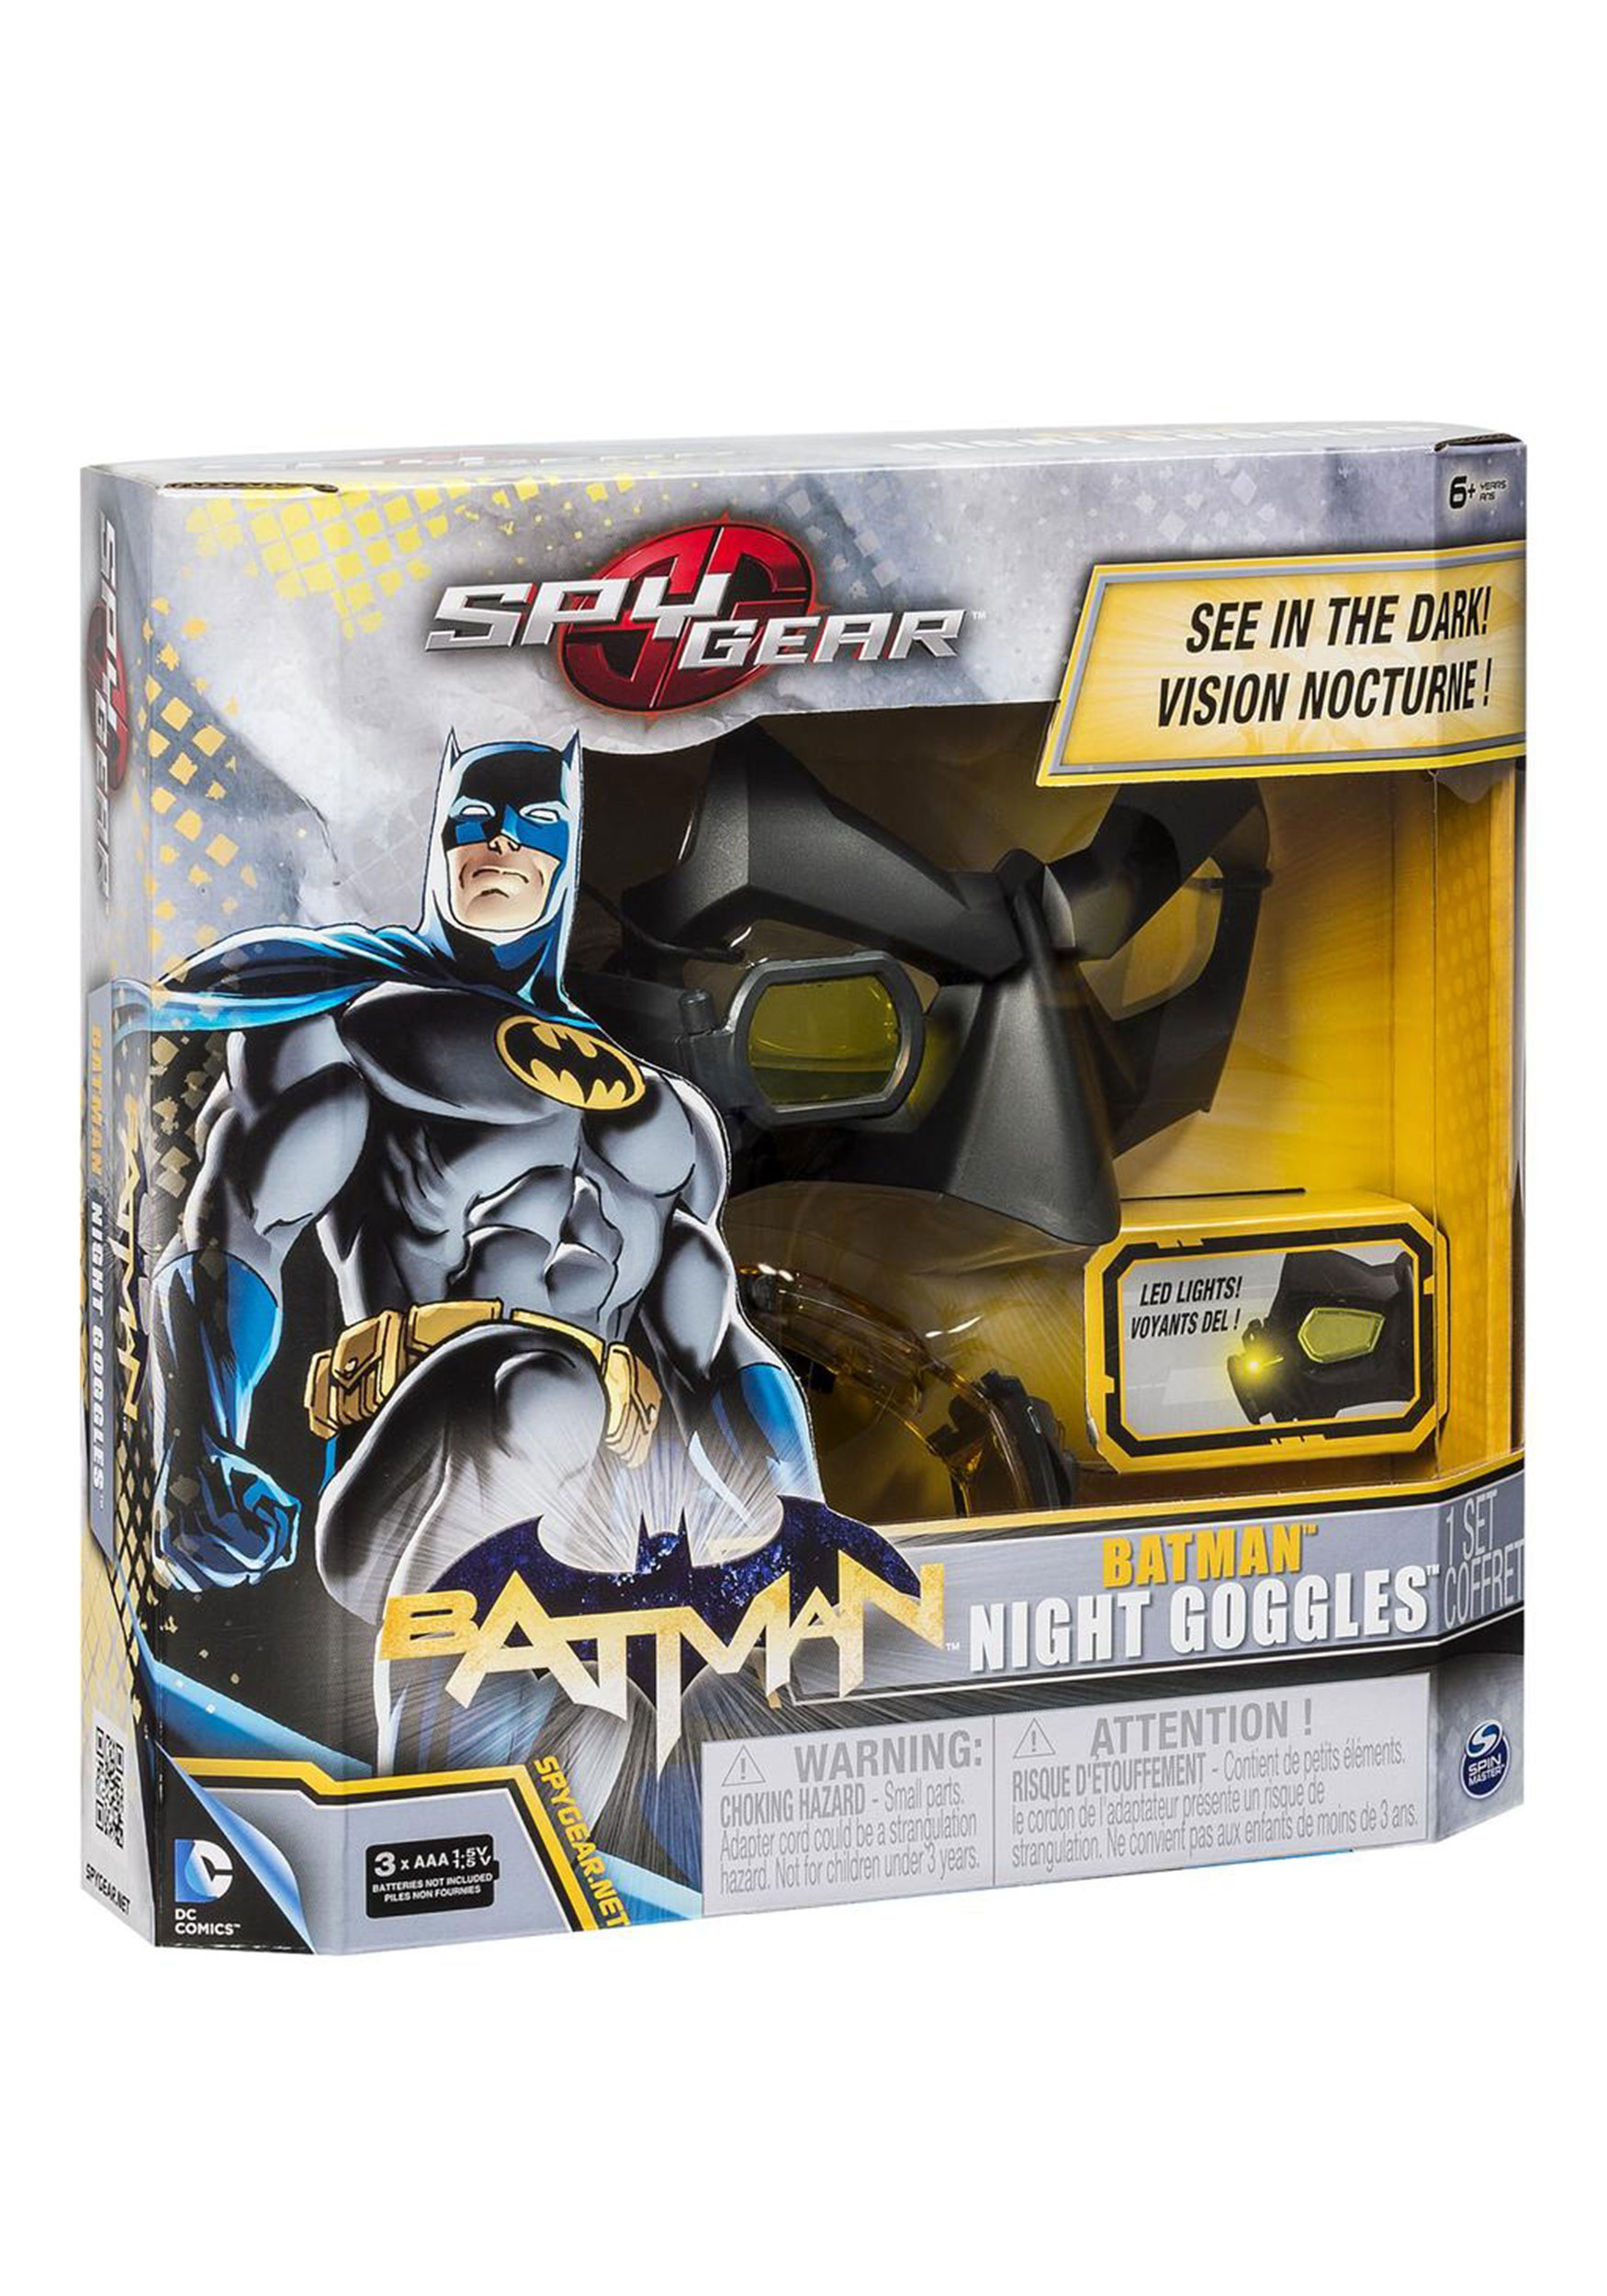 Batman Night Goggle Mask SA6024983